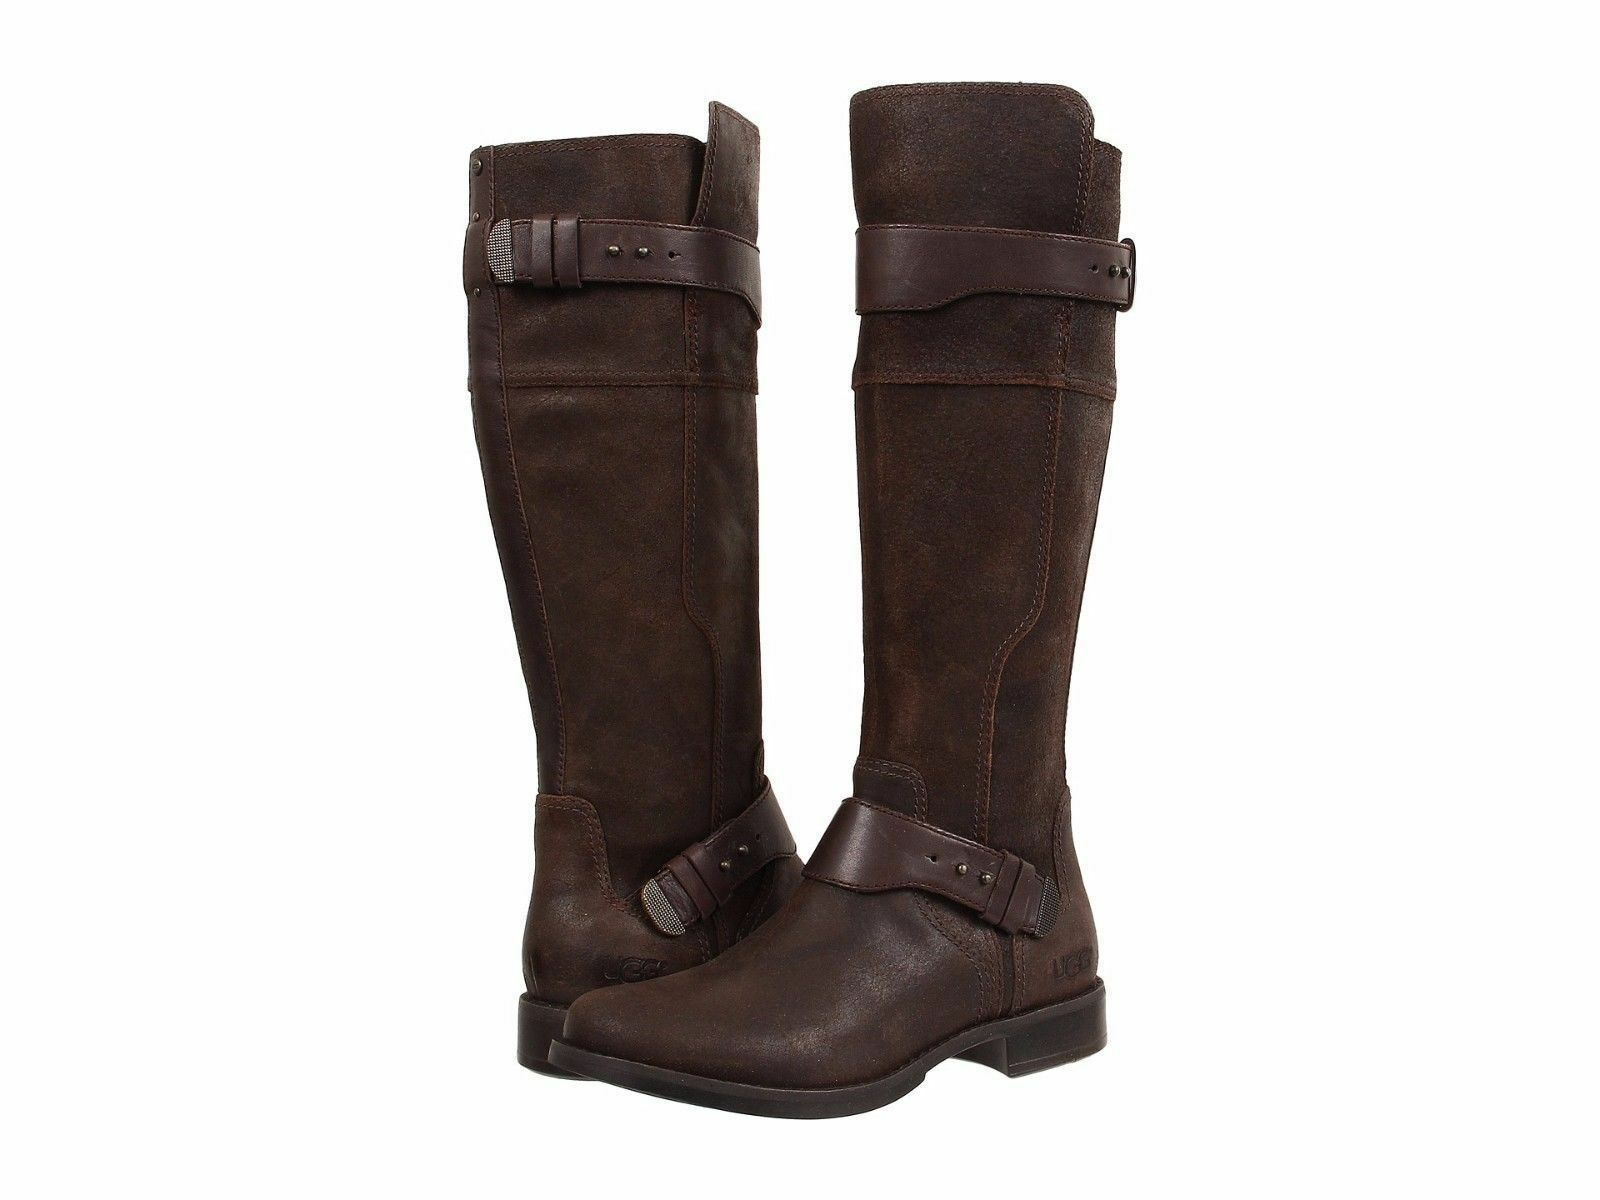 Ugg Australia NIB Women's Sz 9 Dayle Lodge Brown Tall Leather Boots w/ Sheepskin